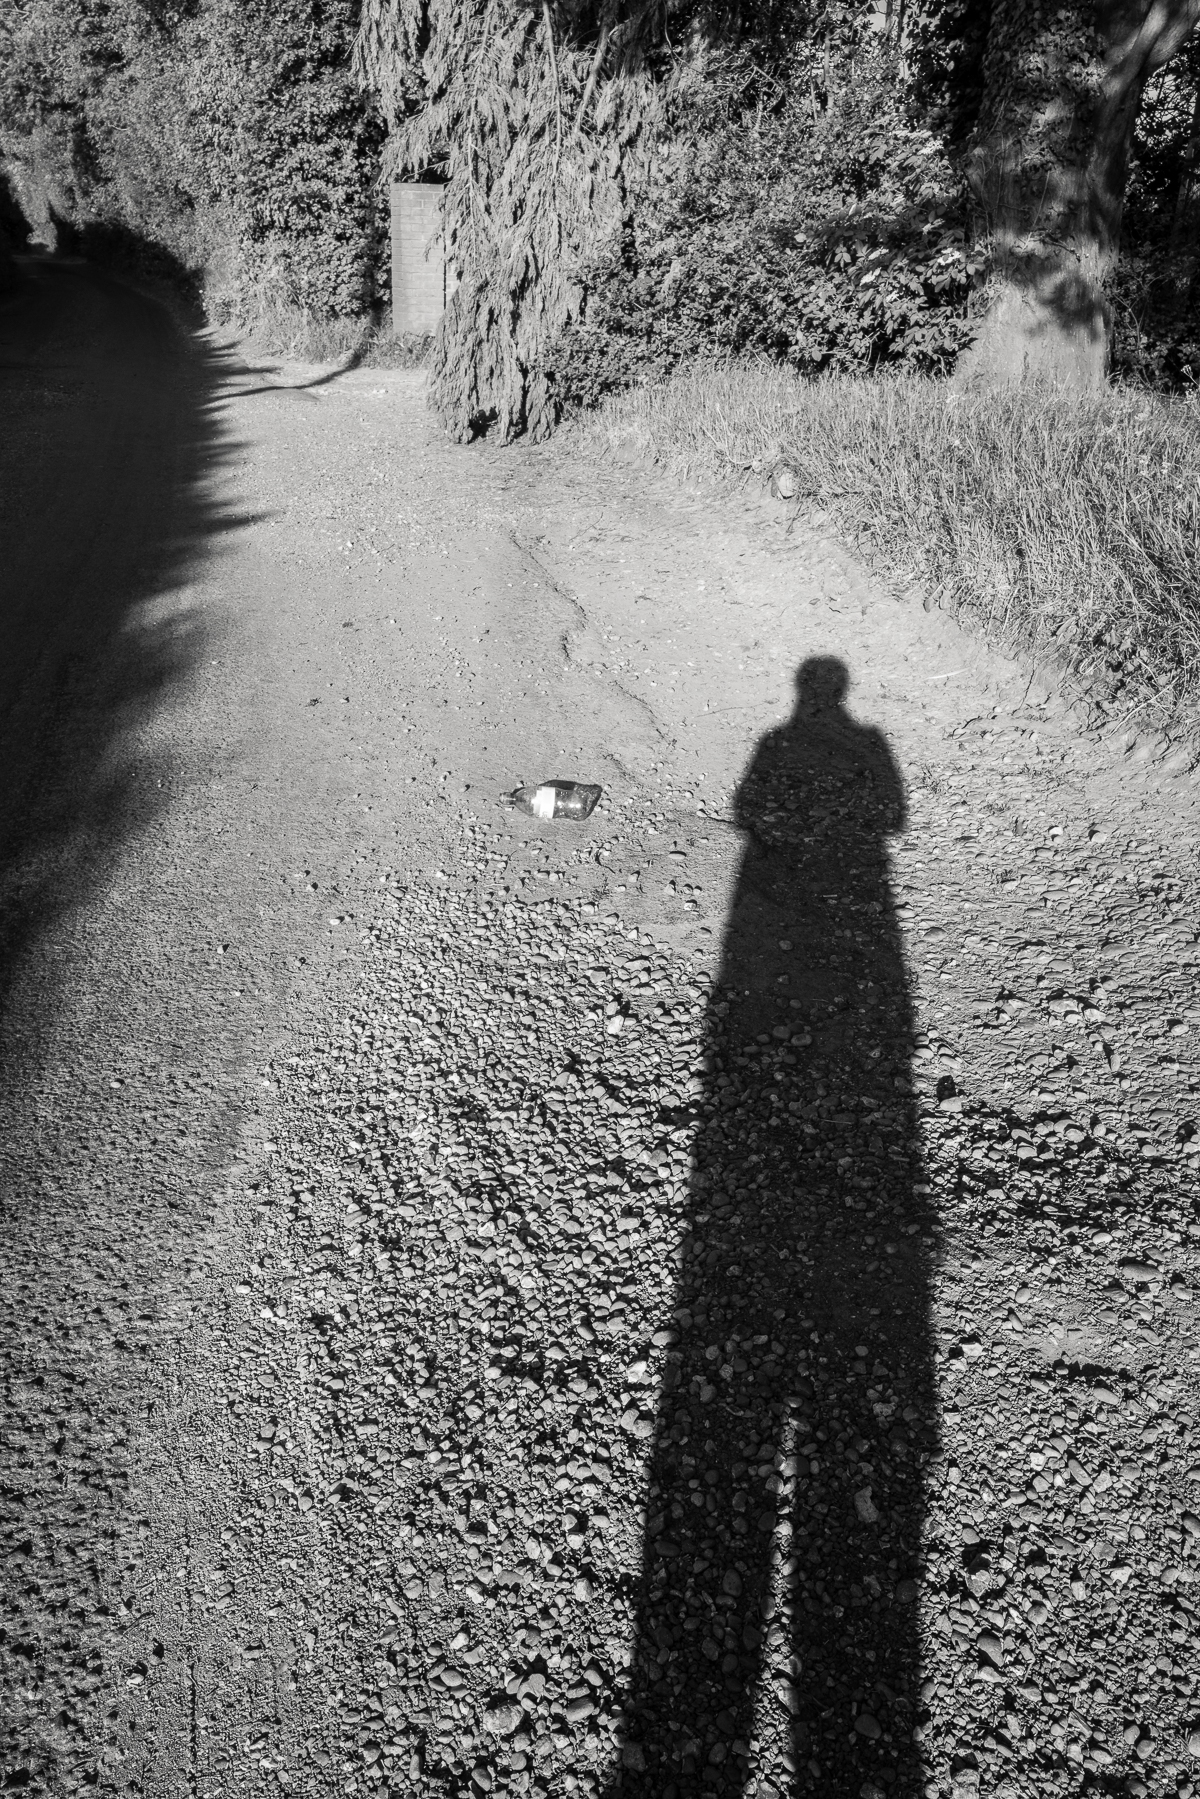 Long shadow in evening sun